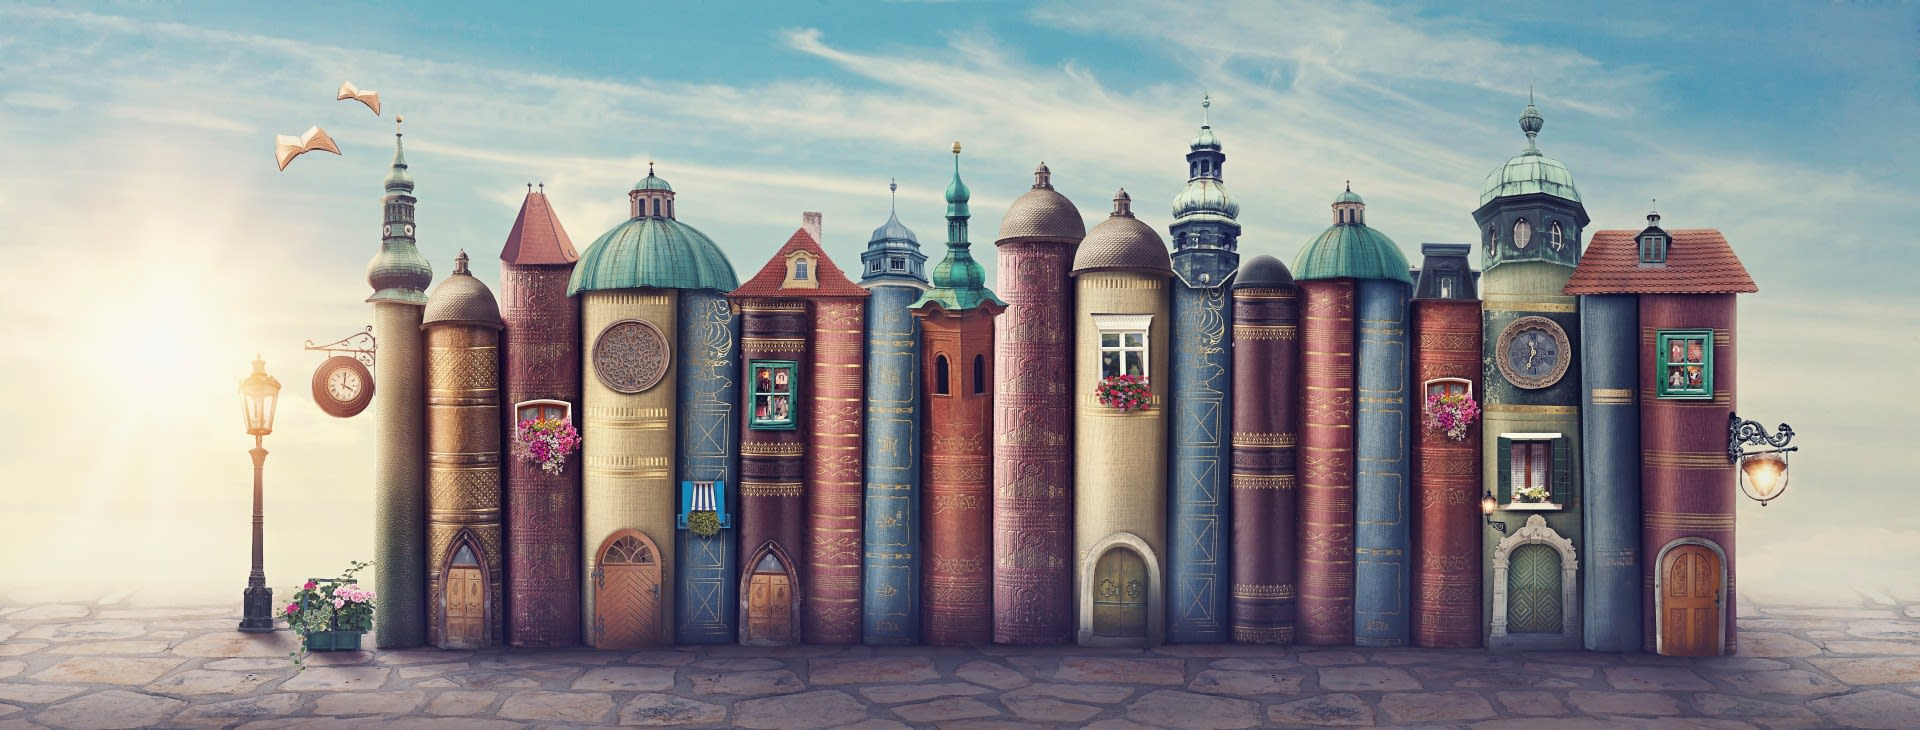 Oxford Literary Festival 2019 Little Town of Books